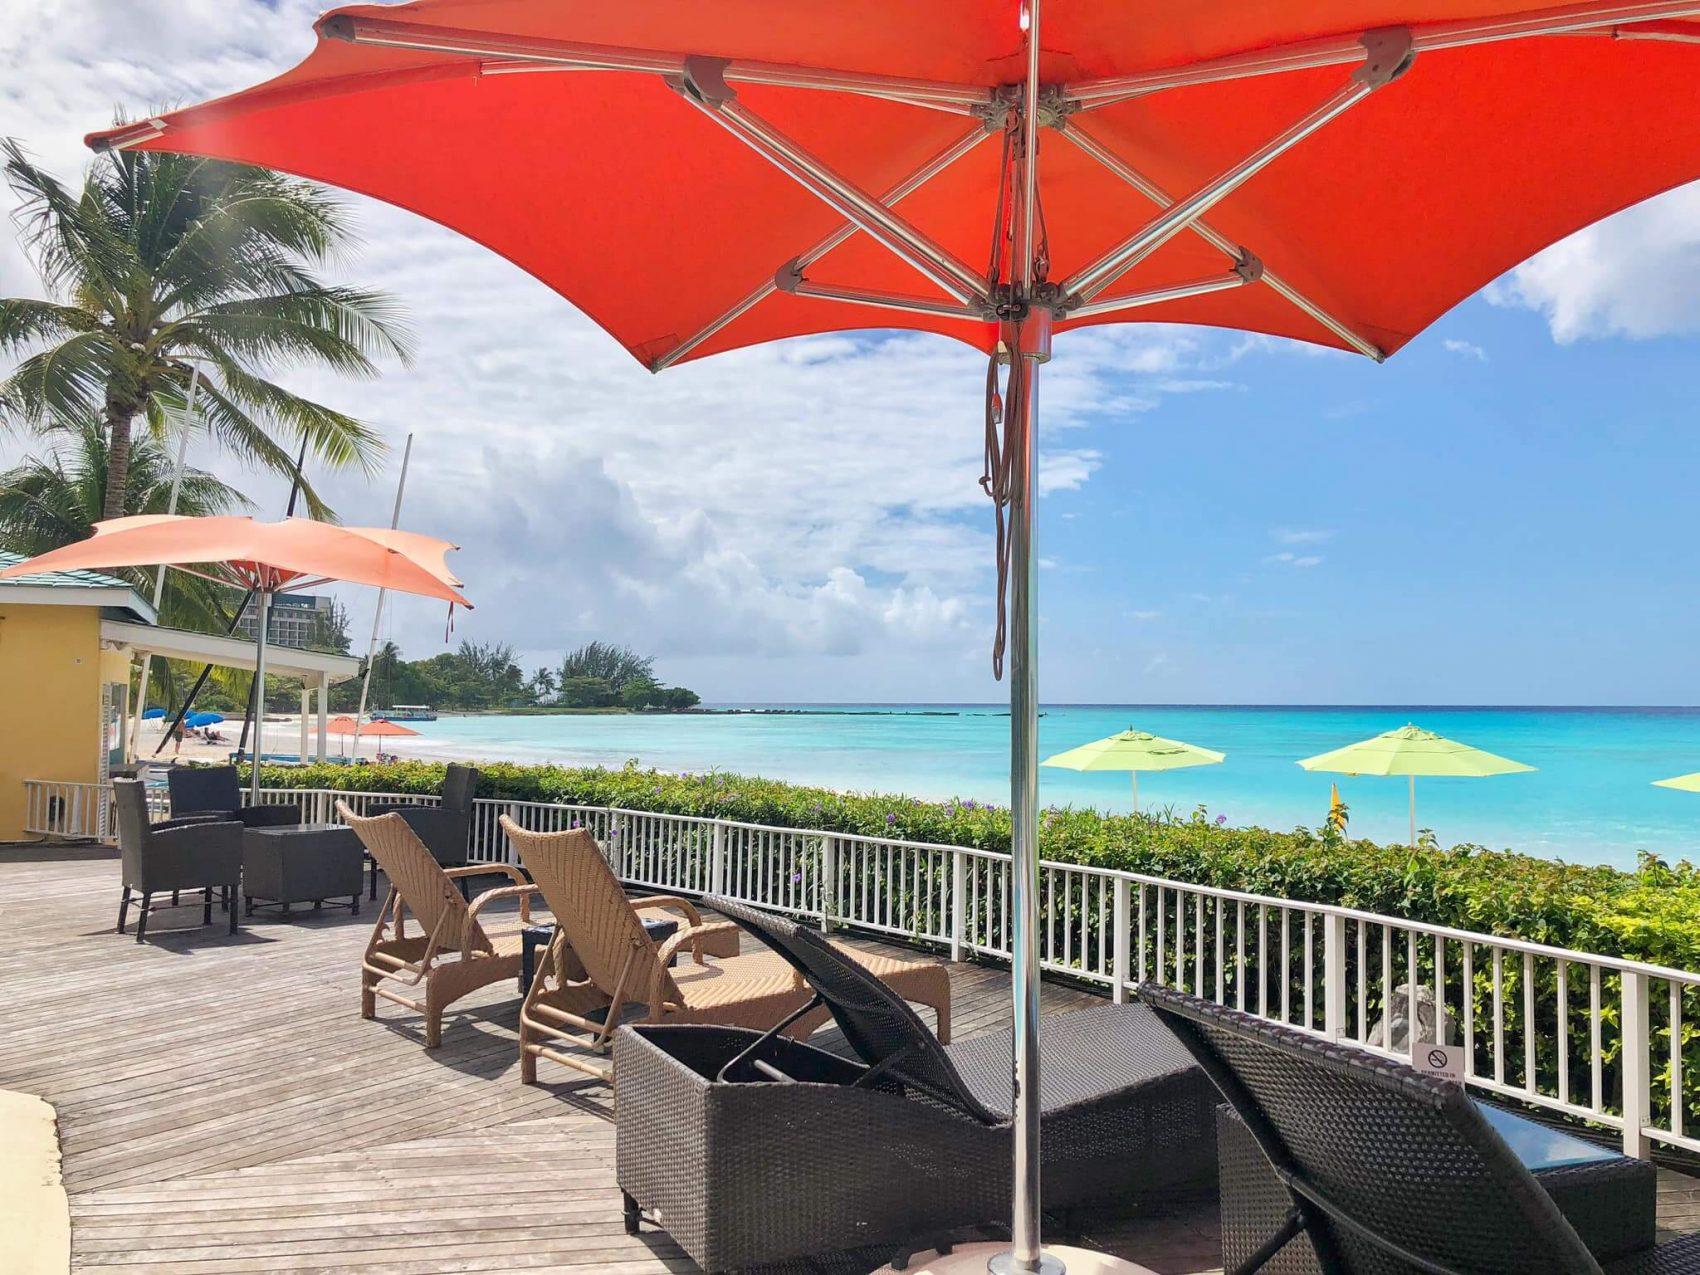 The Radisson Aquatica Resort Barbados